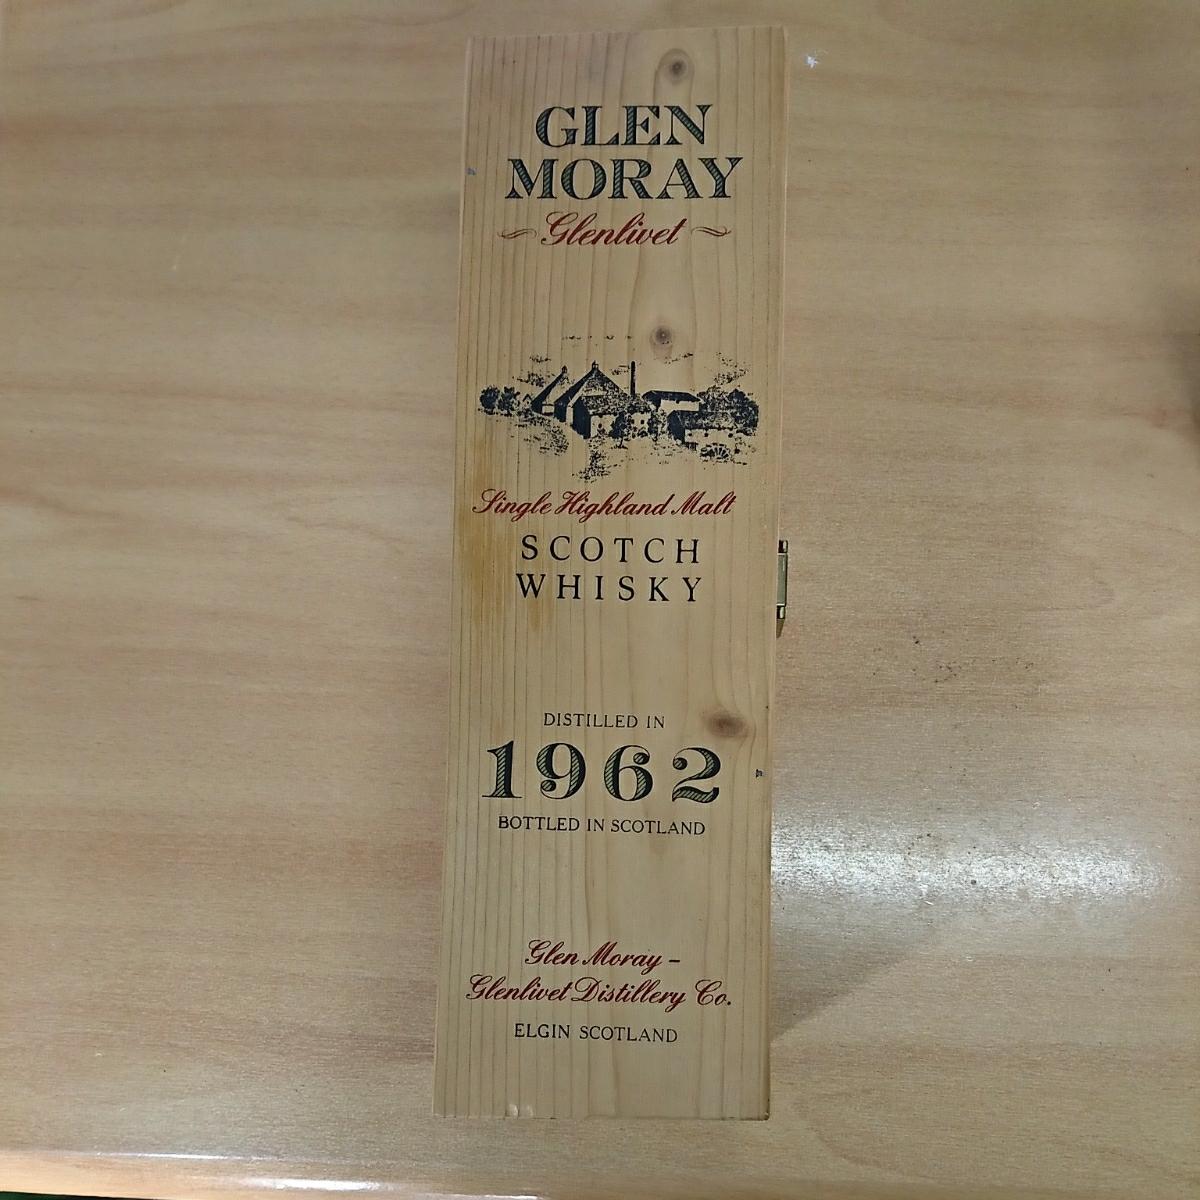 GLEN MORAY 1962 グレン マレイ 木箱付 古酒 未開封 貴重です _画像4